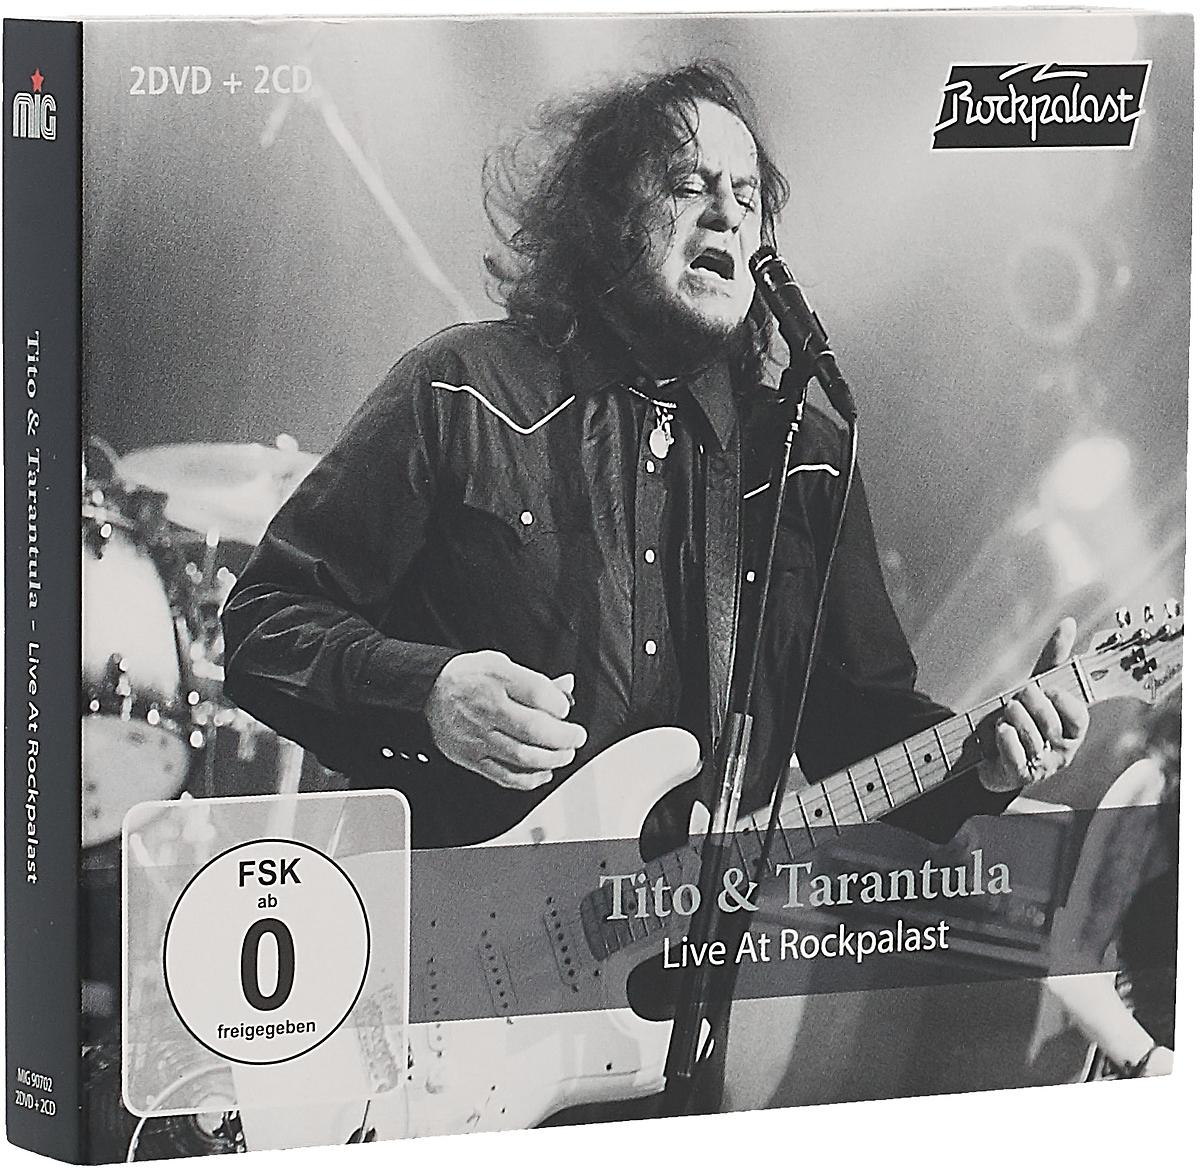 Tito & Tarantula Tito & Tarantula. Live At Rockpalast 2008 & 1998 (2 CD + 2 DVD)